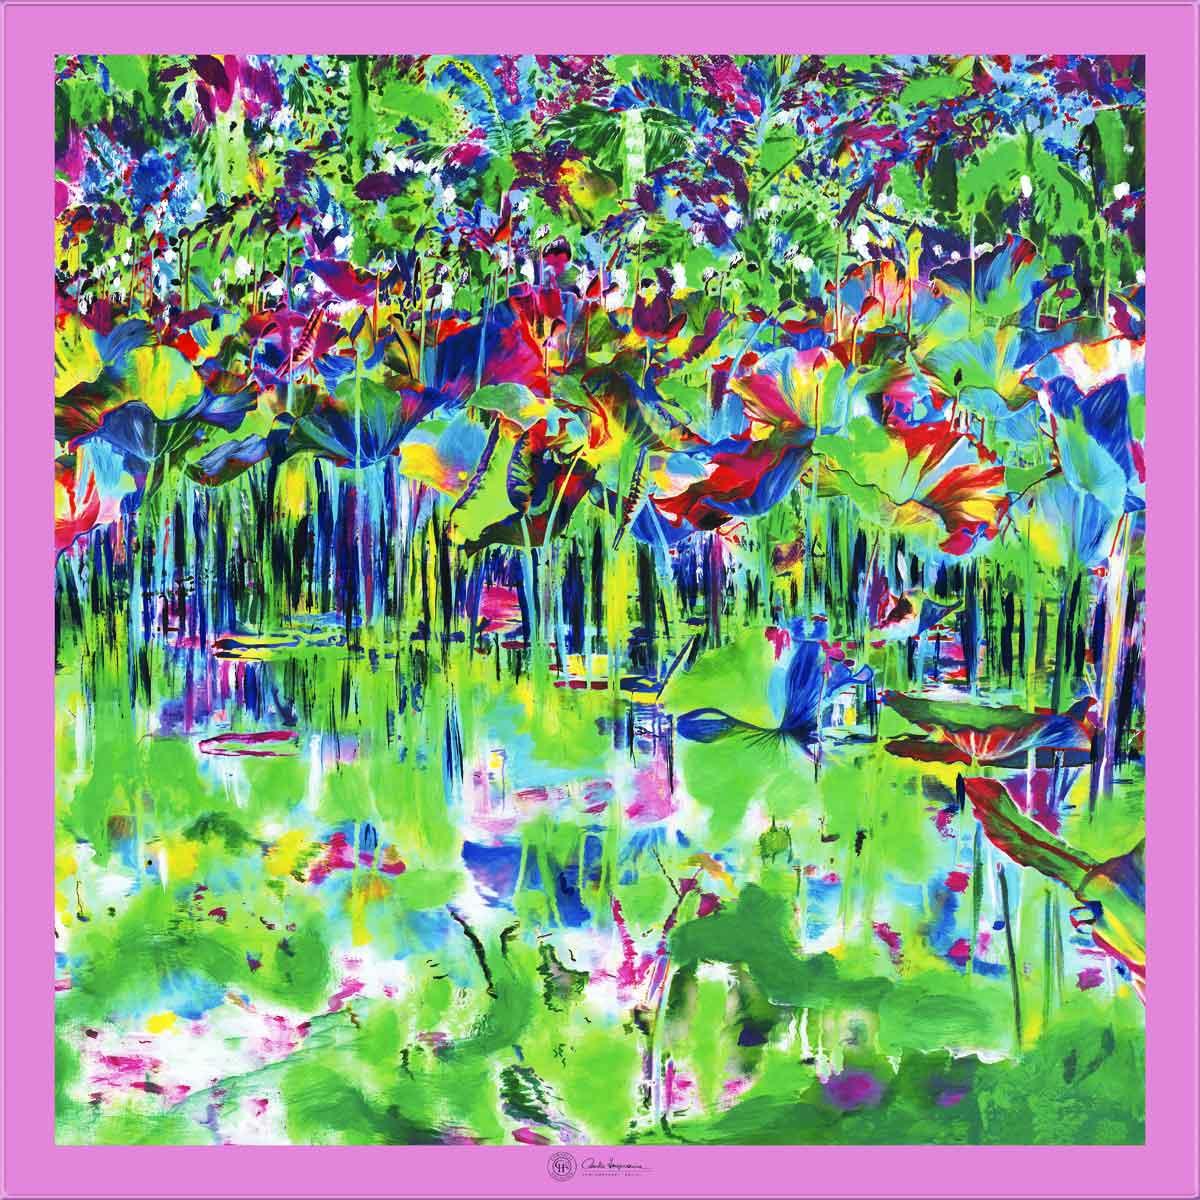 Cornelia Hagmann Silk Scarf The Majesty of Colours Pink La Galleria Art and Design, Seidenschal, sciarpa di seta, foulard soie,